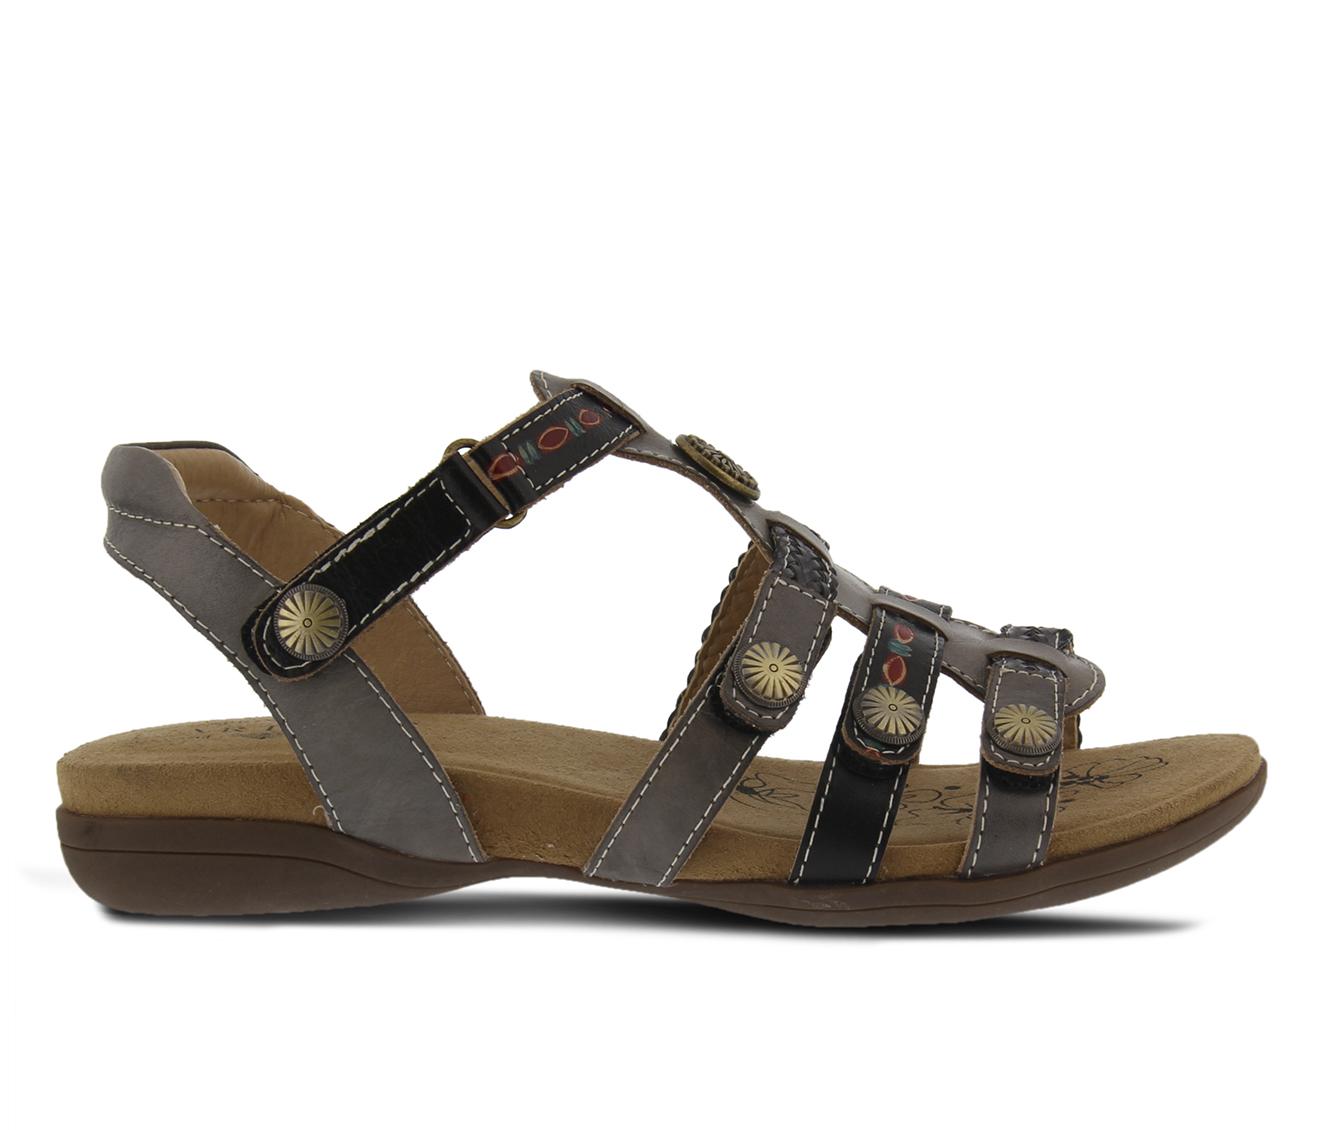 L'Artiste Jerlene Women's Sandal (Gray Leather)